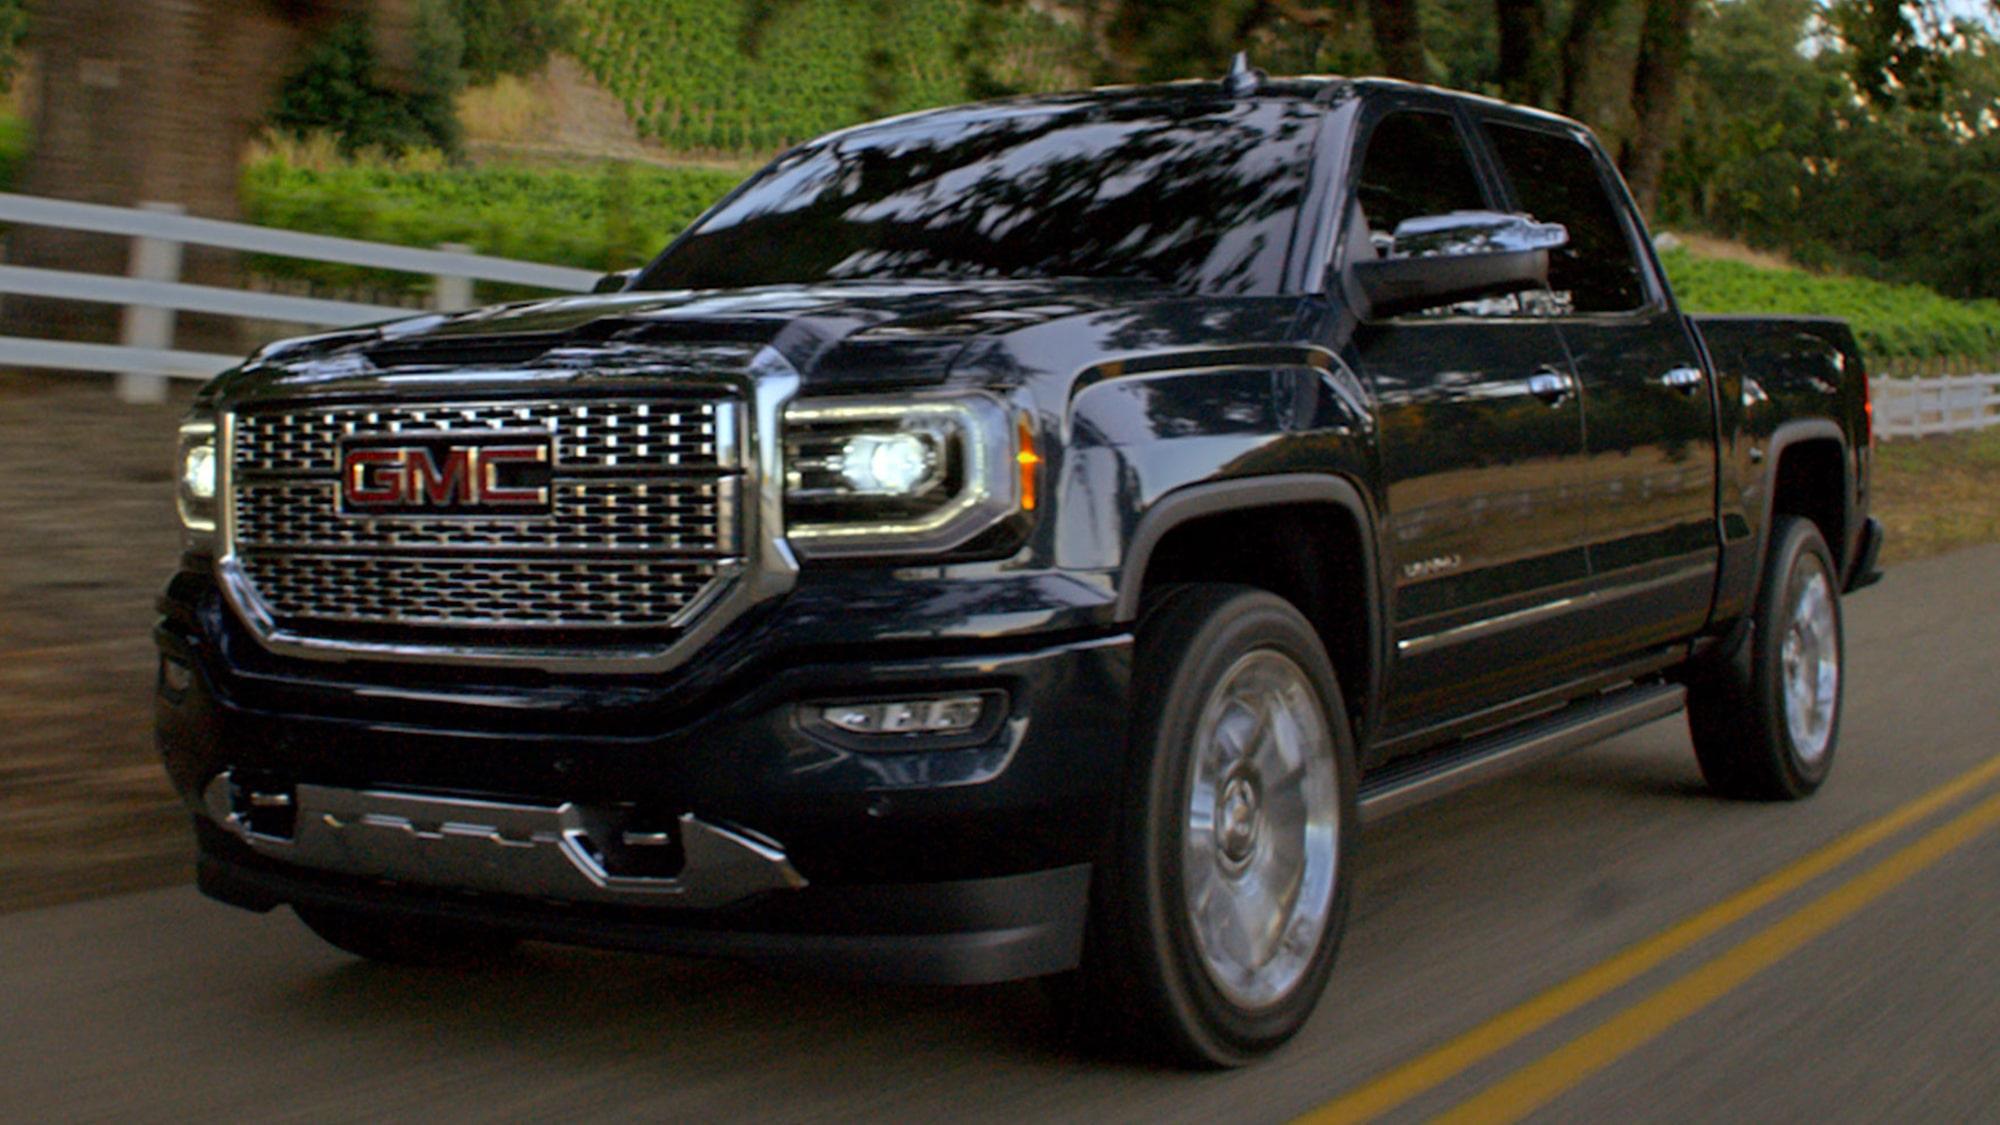 new gmc denali luxury vehicles luxury trucks and suvs rh gmc com GMC Denali 2019 GMC Sierra